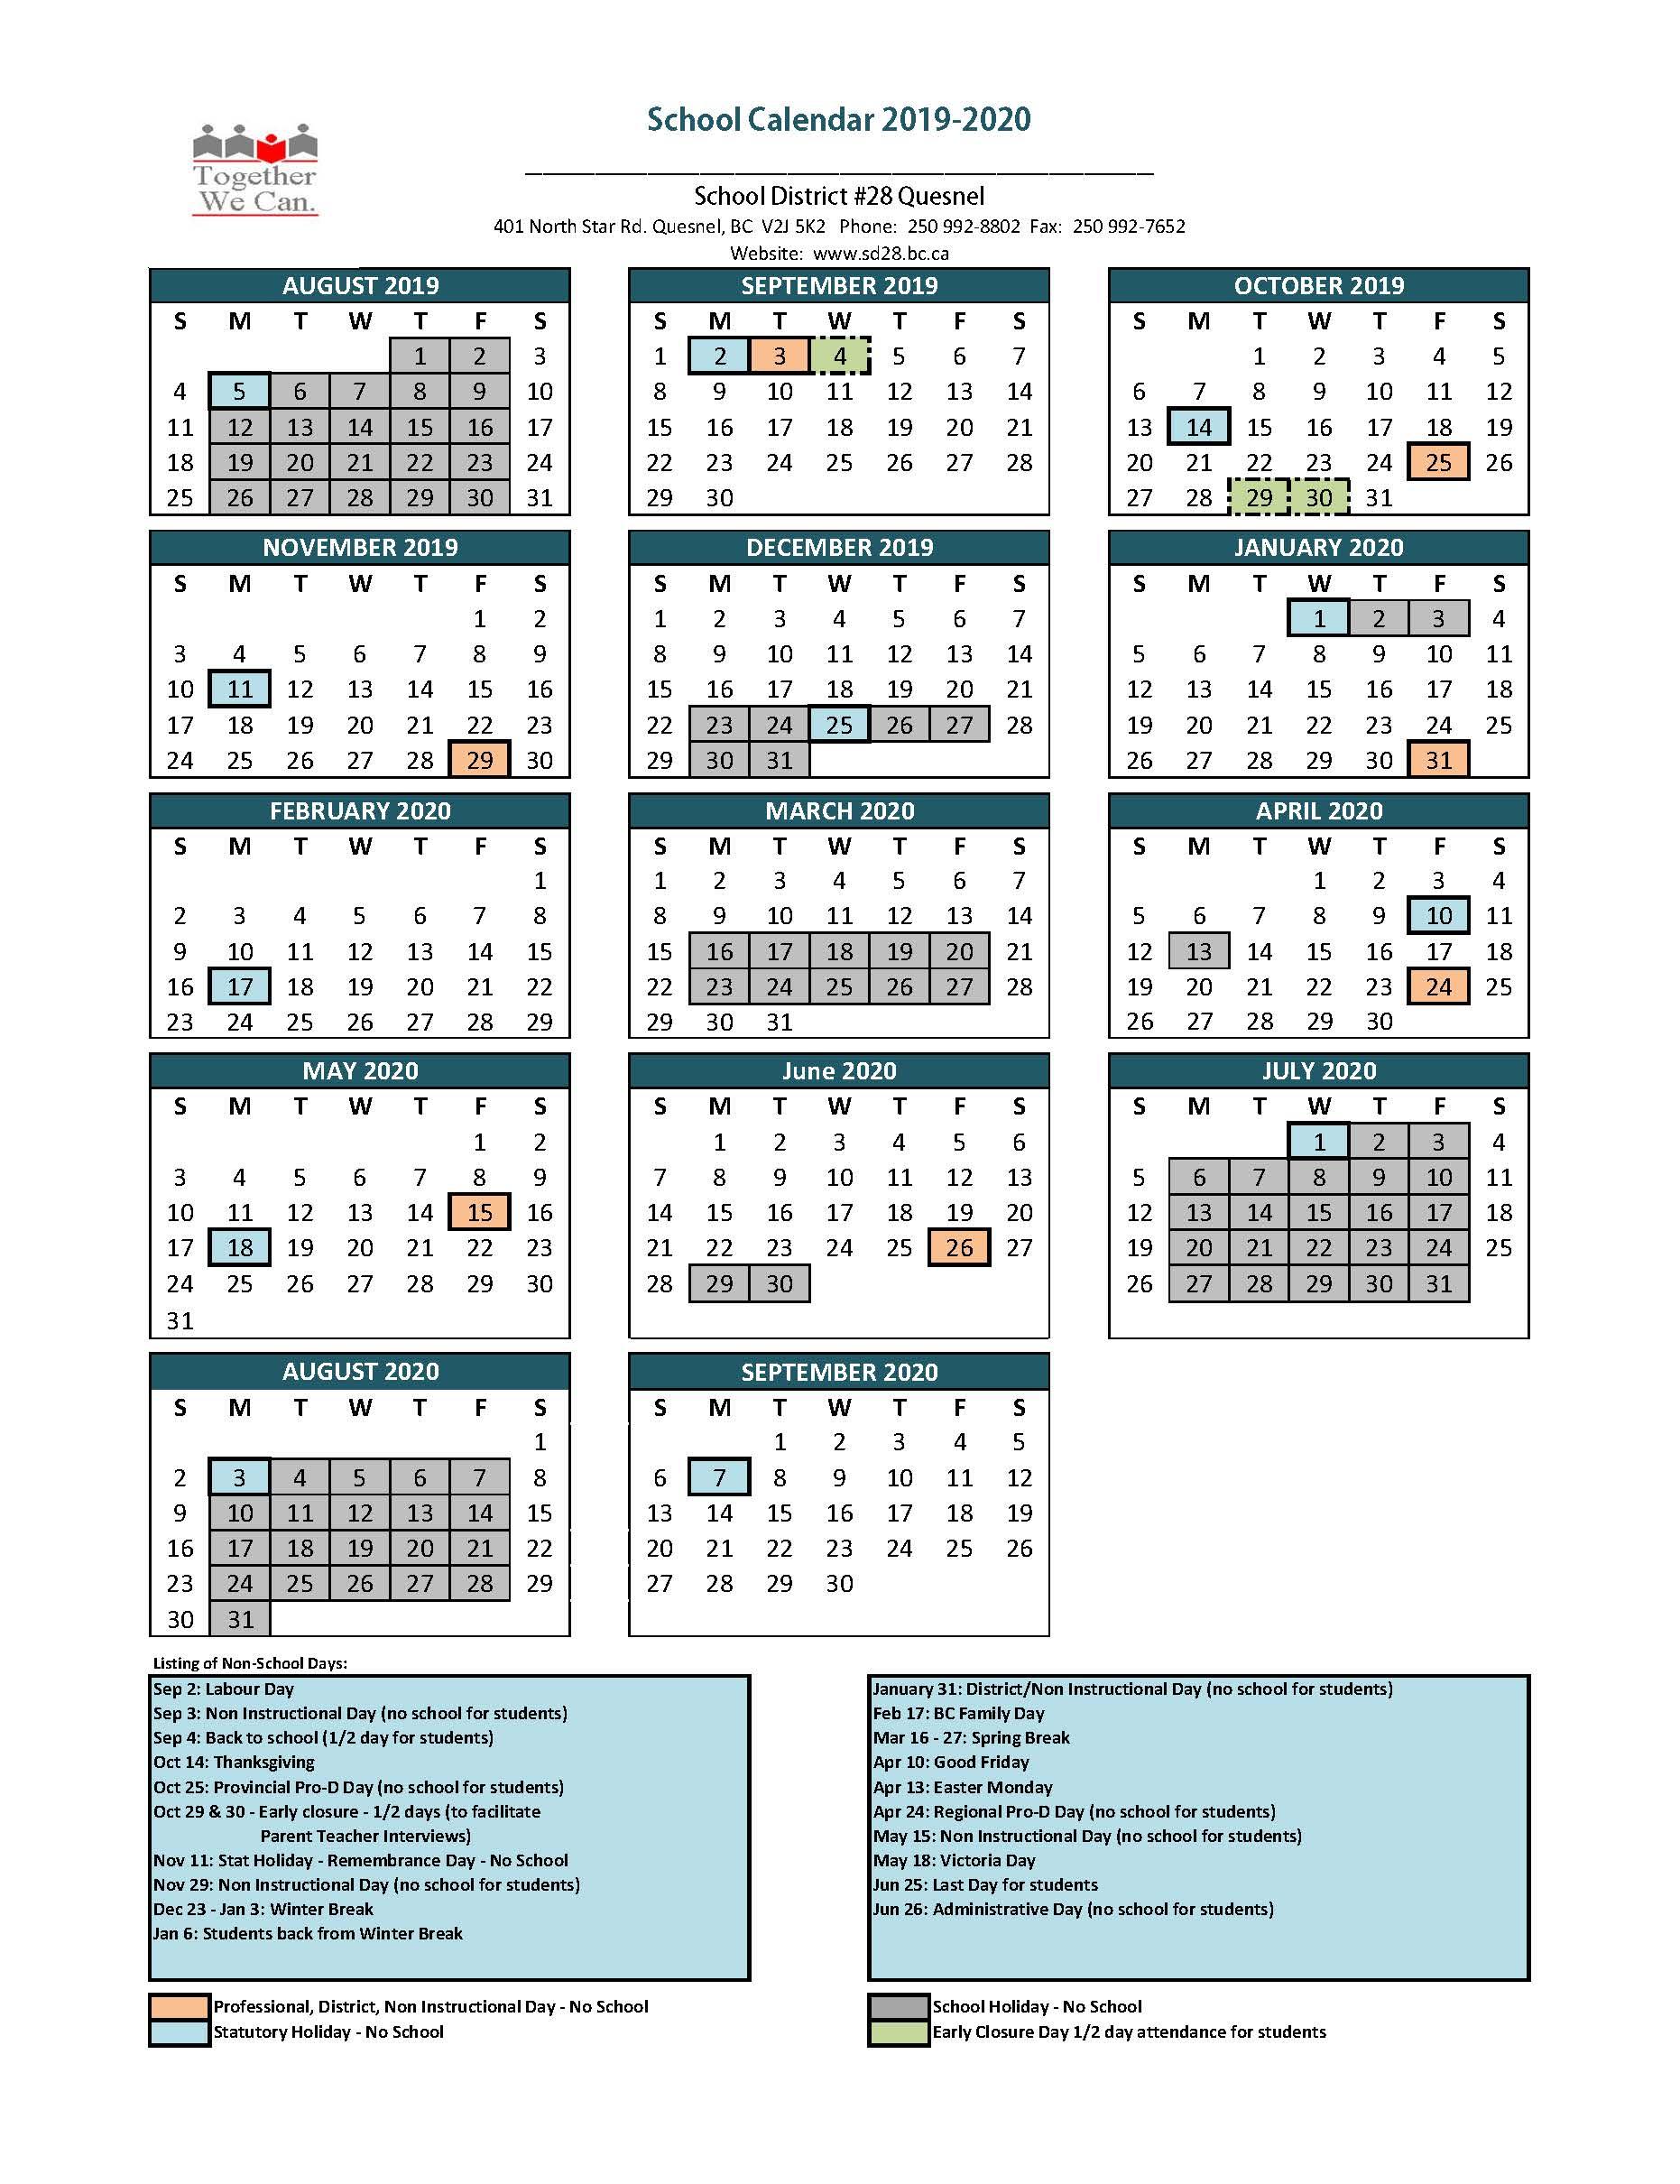 2019-2020 School Calendar | School District 28 (Quesnel)